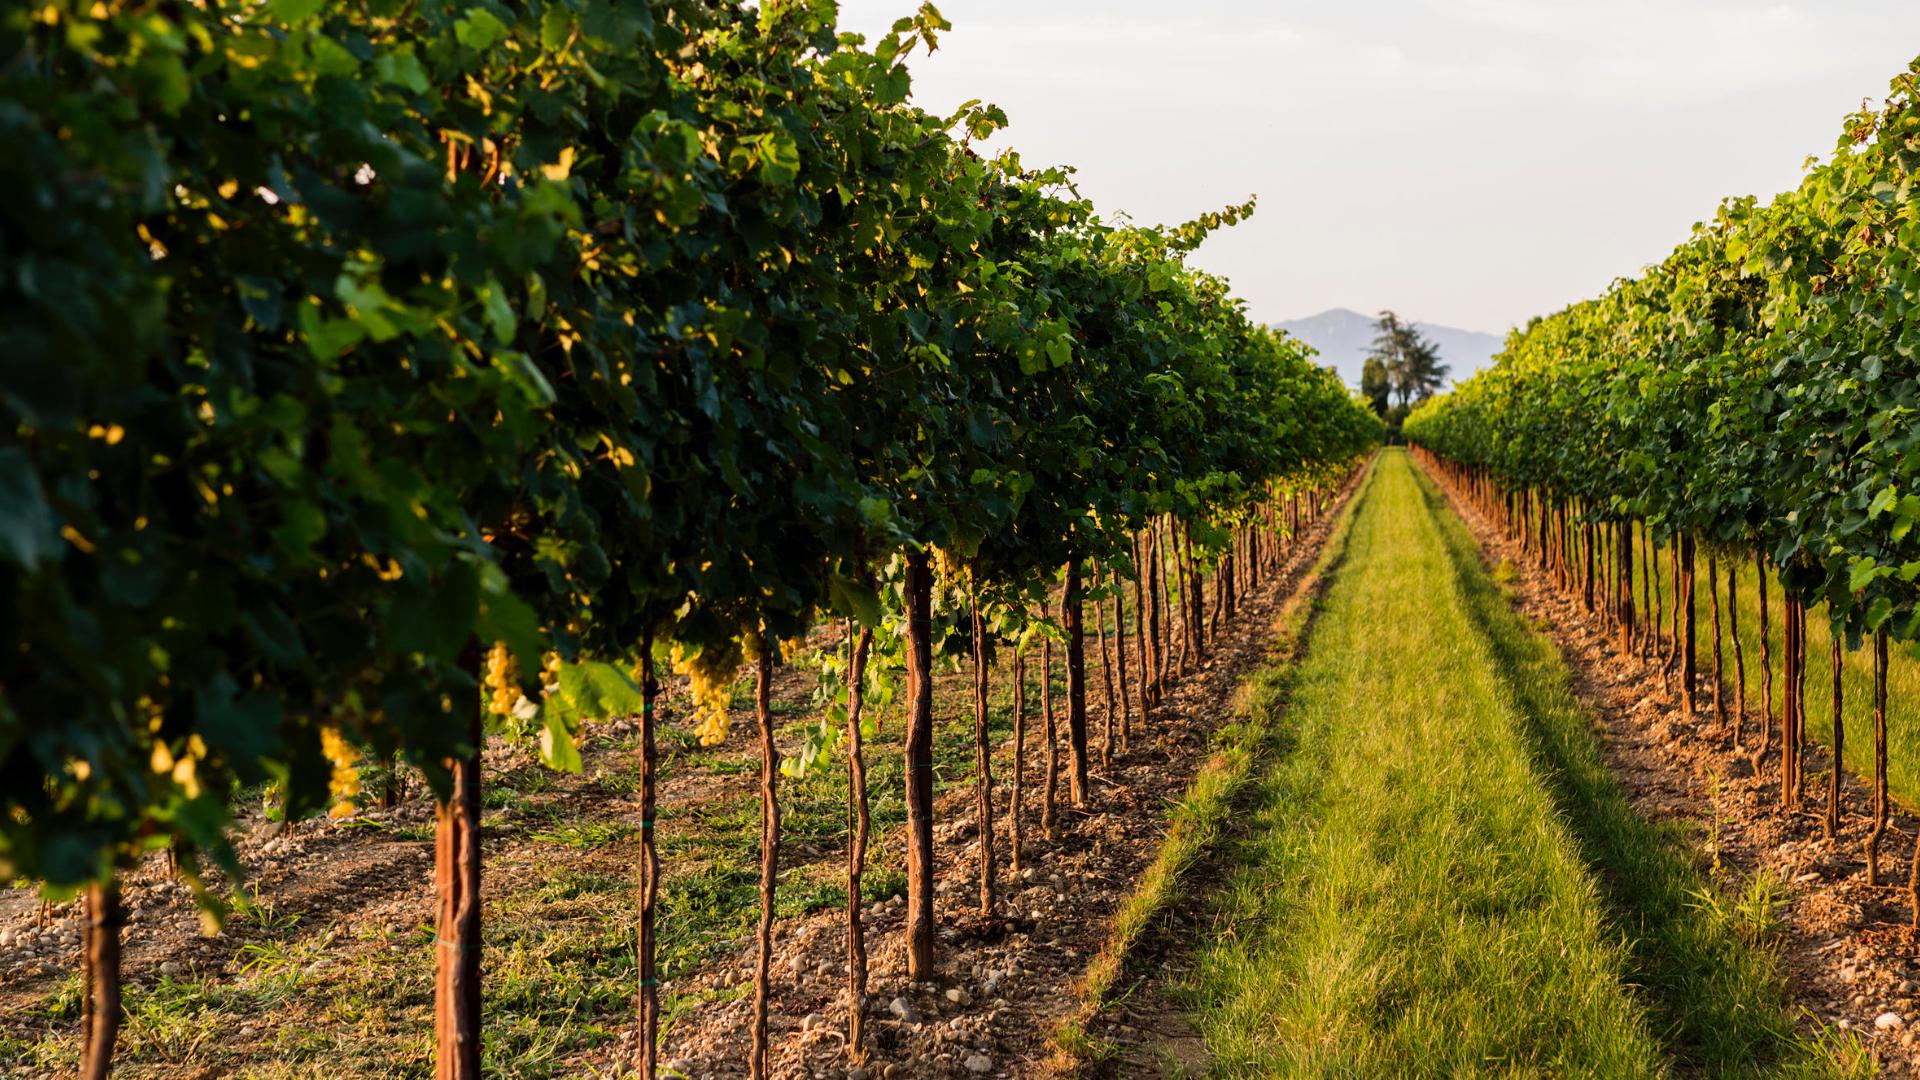 Vendrame vigne del doge